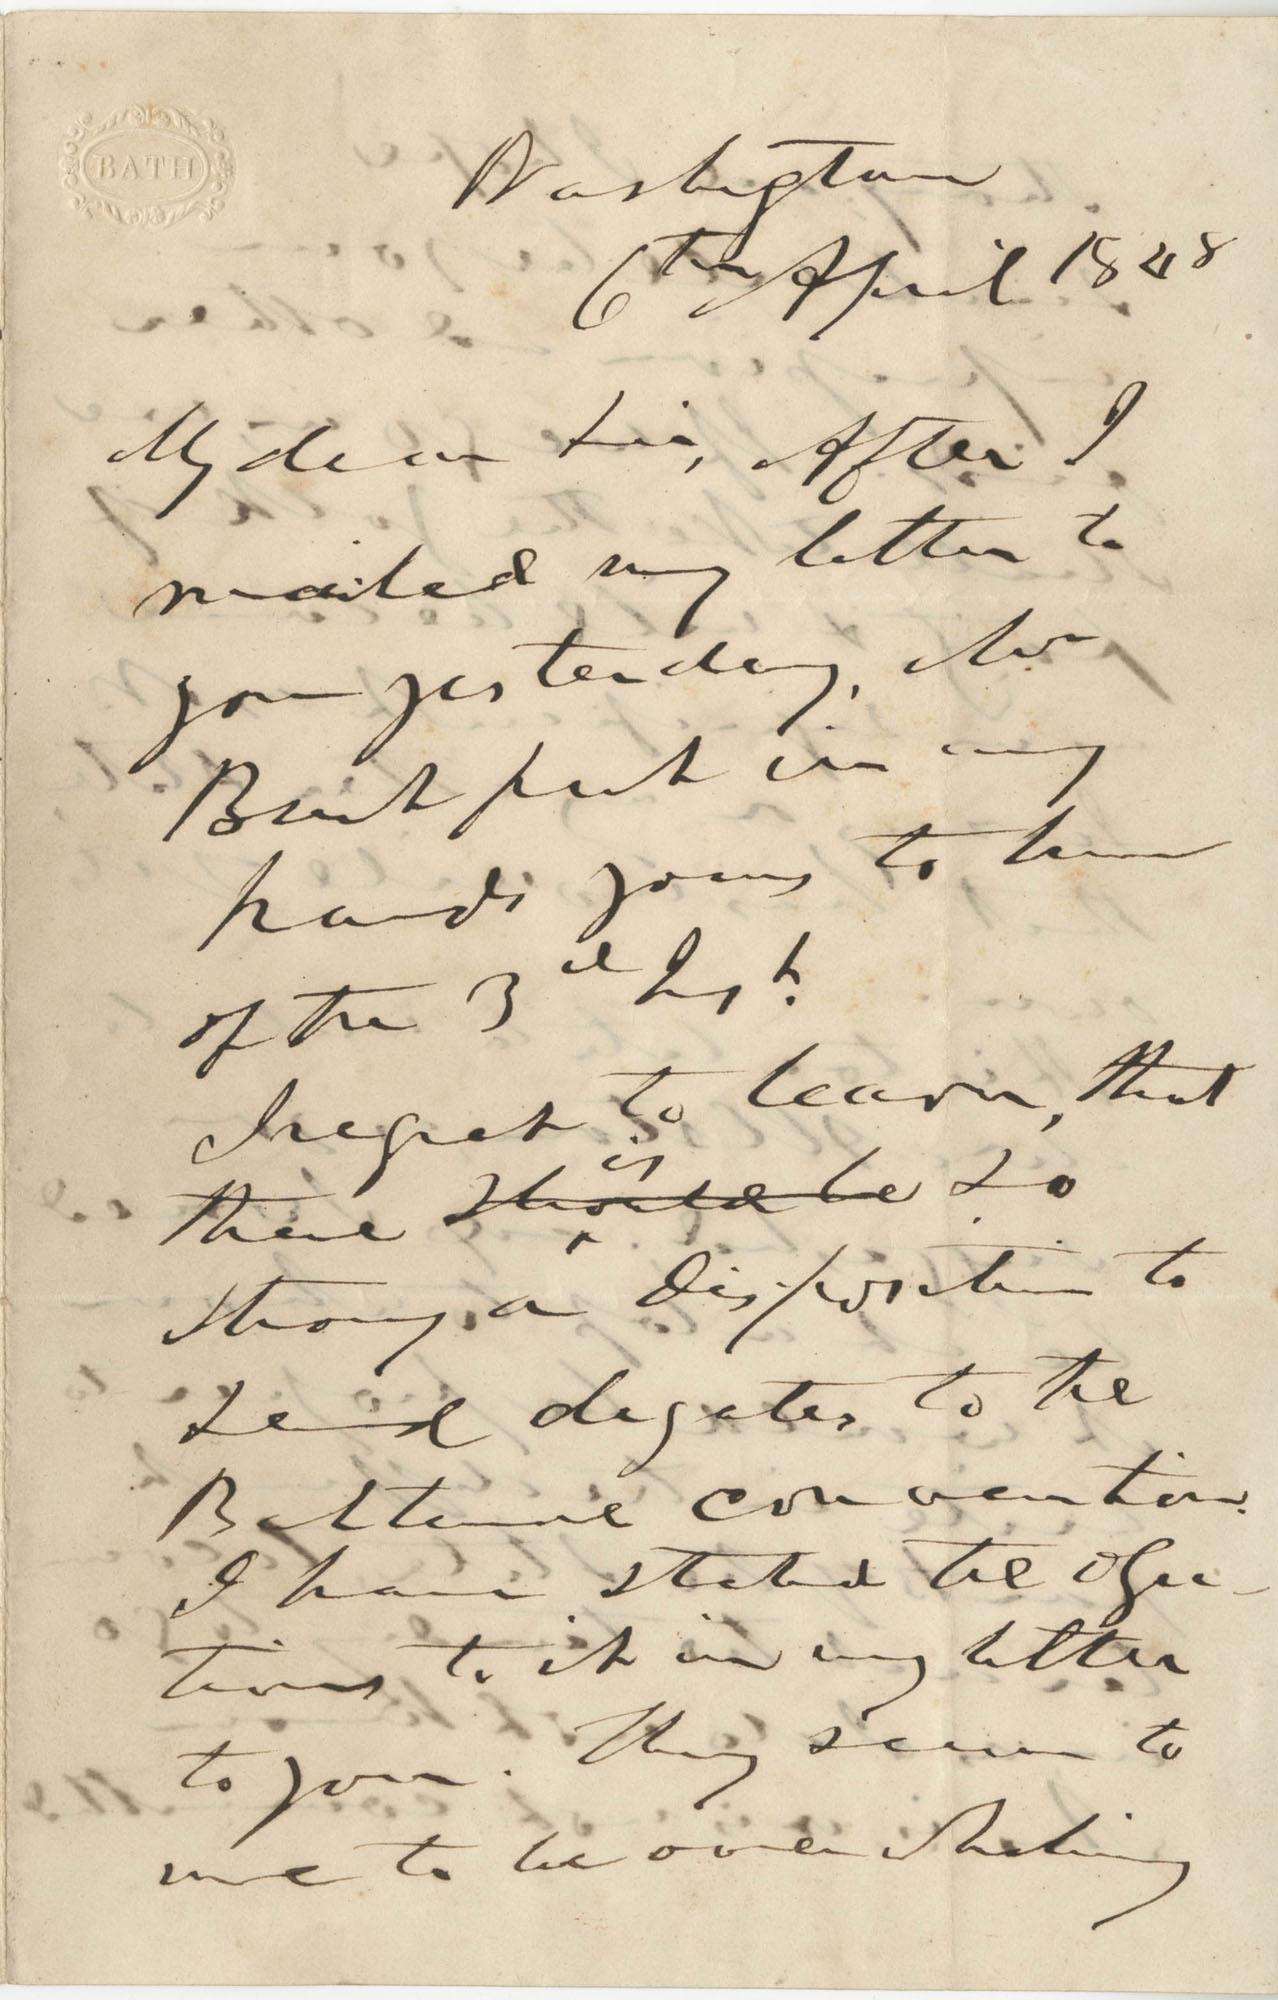 From John C. Calhoun to H. W. Conner